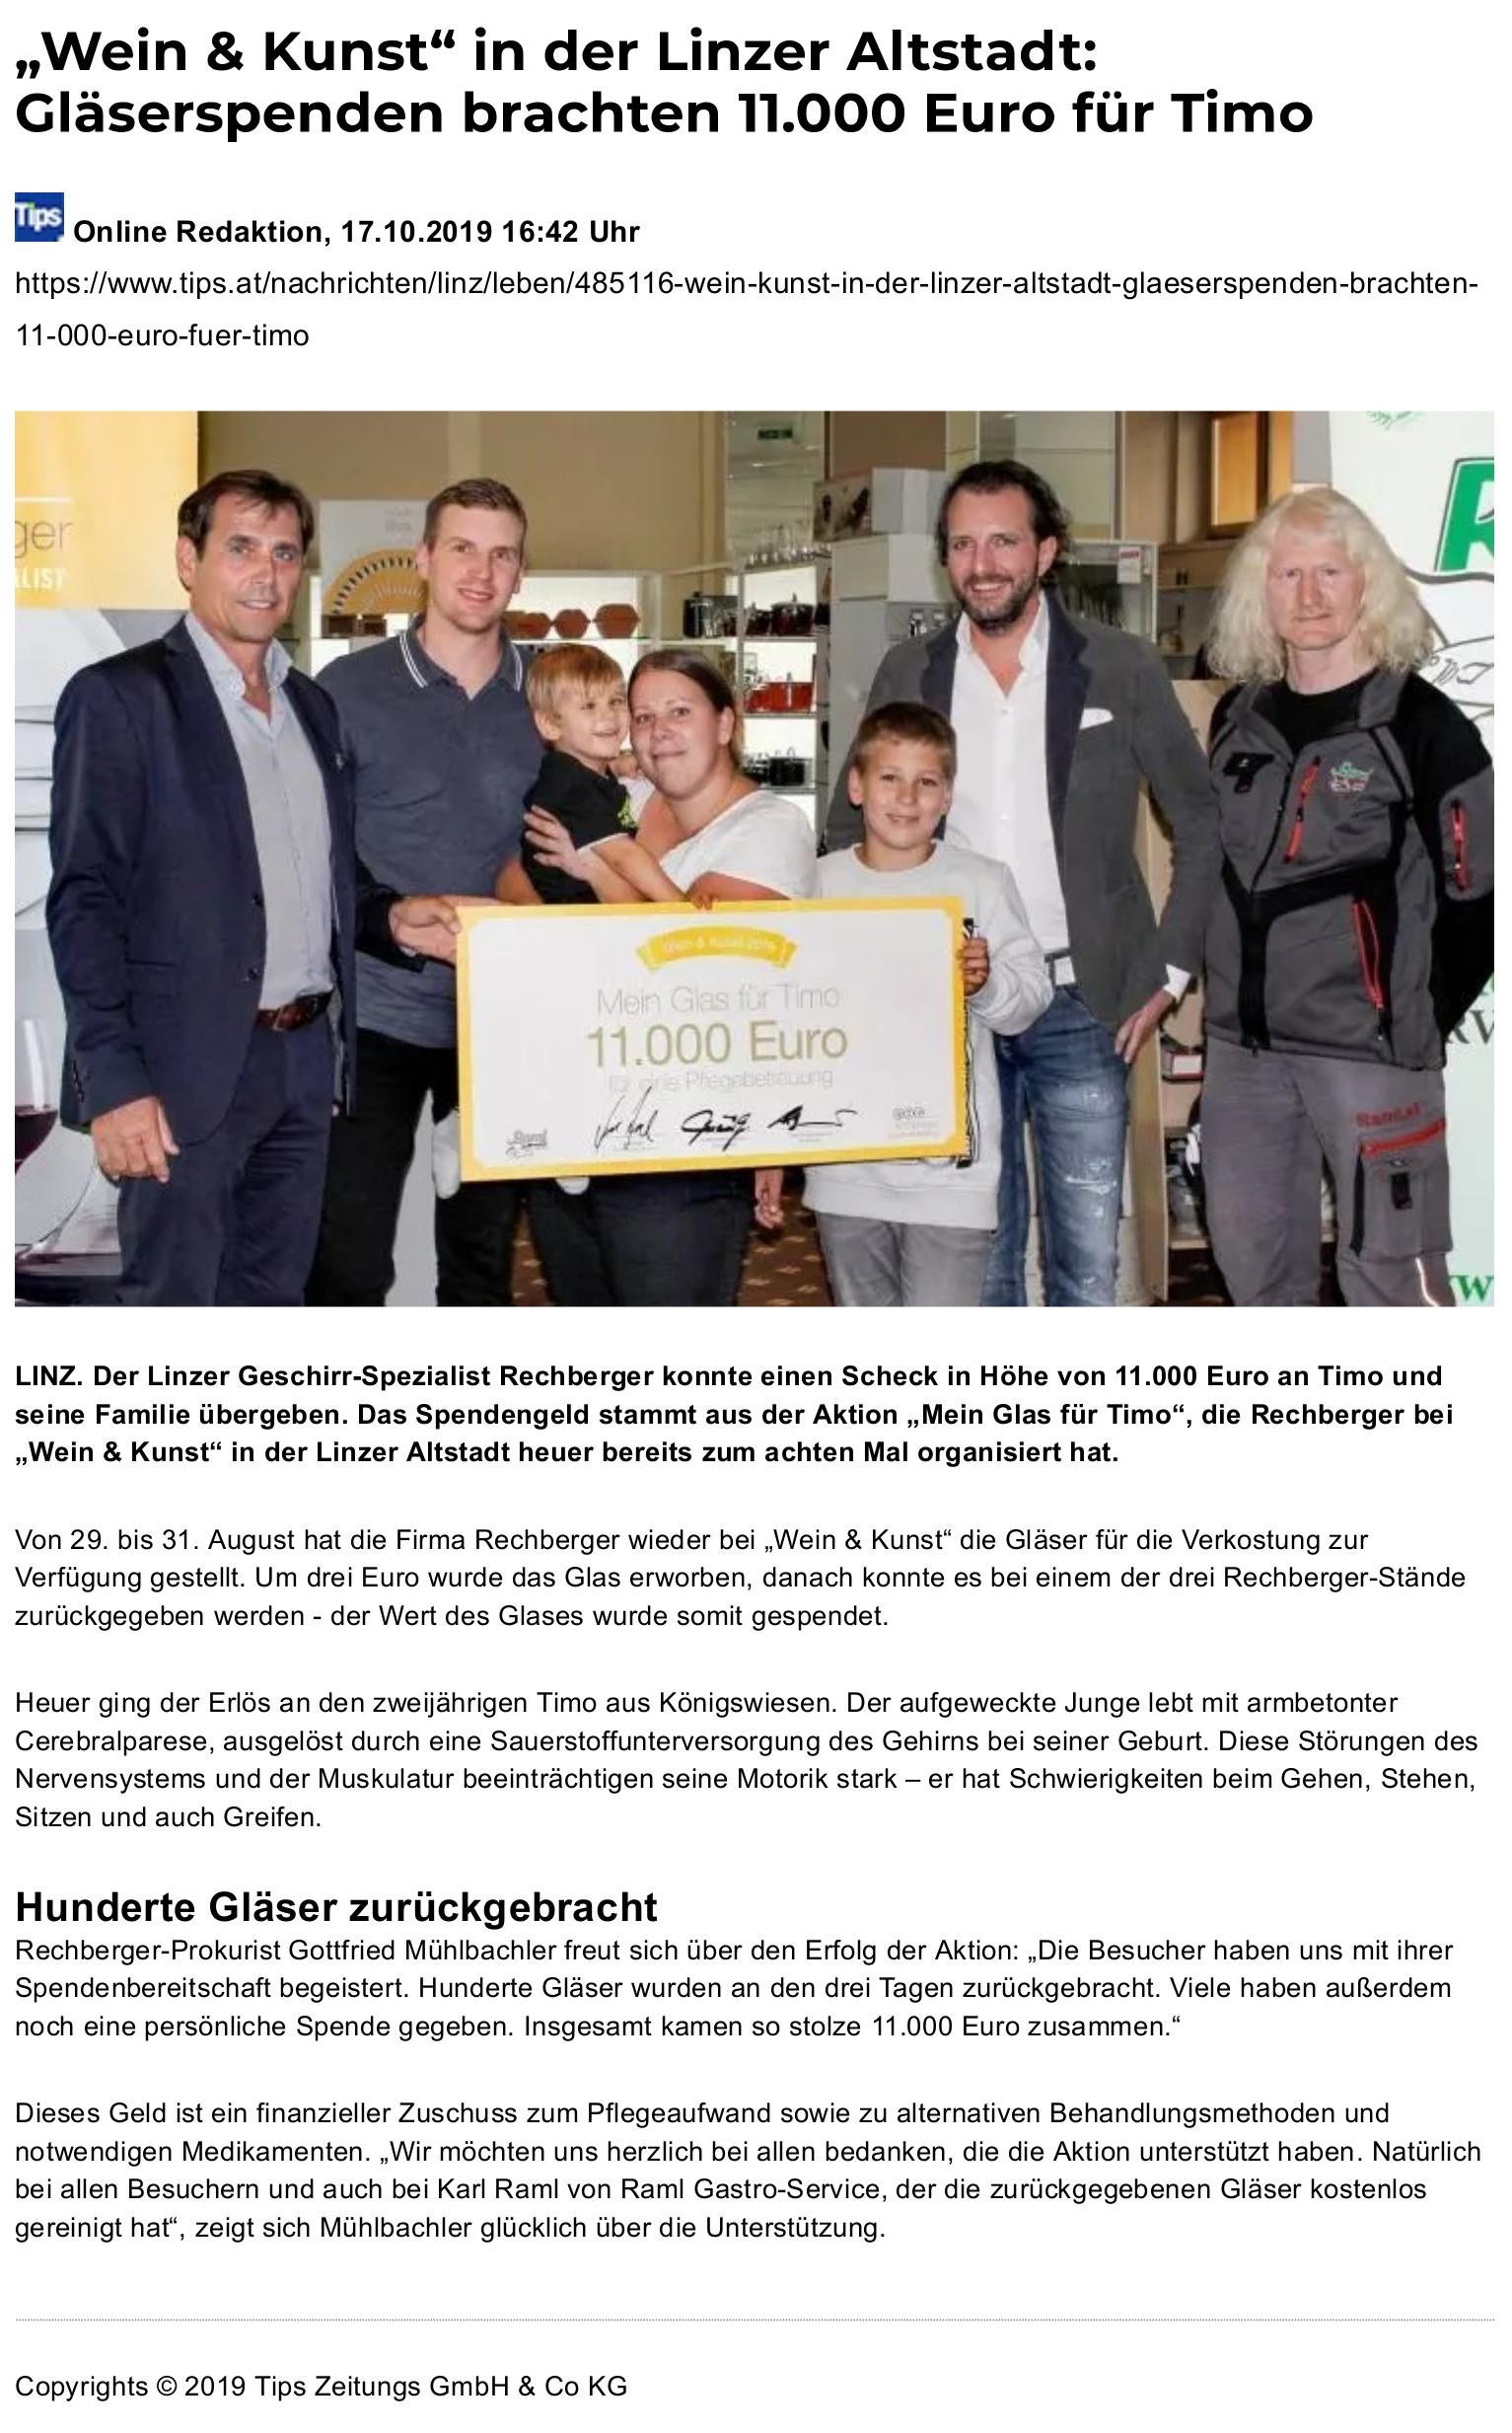 Tips_Mein-Glas-fuer-Timo-2019cj4uDzFfAoQf0